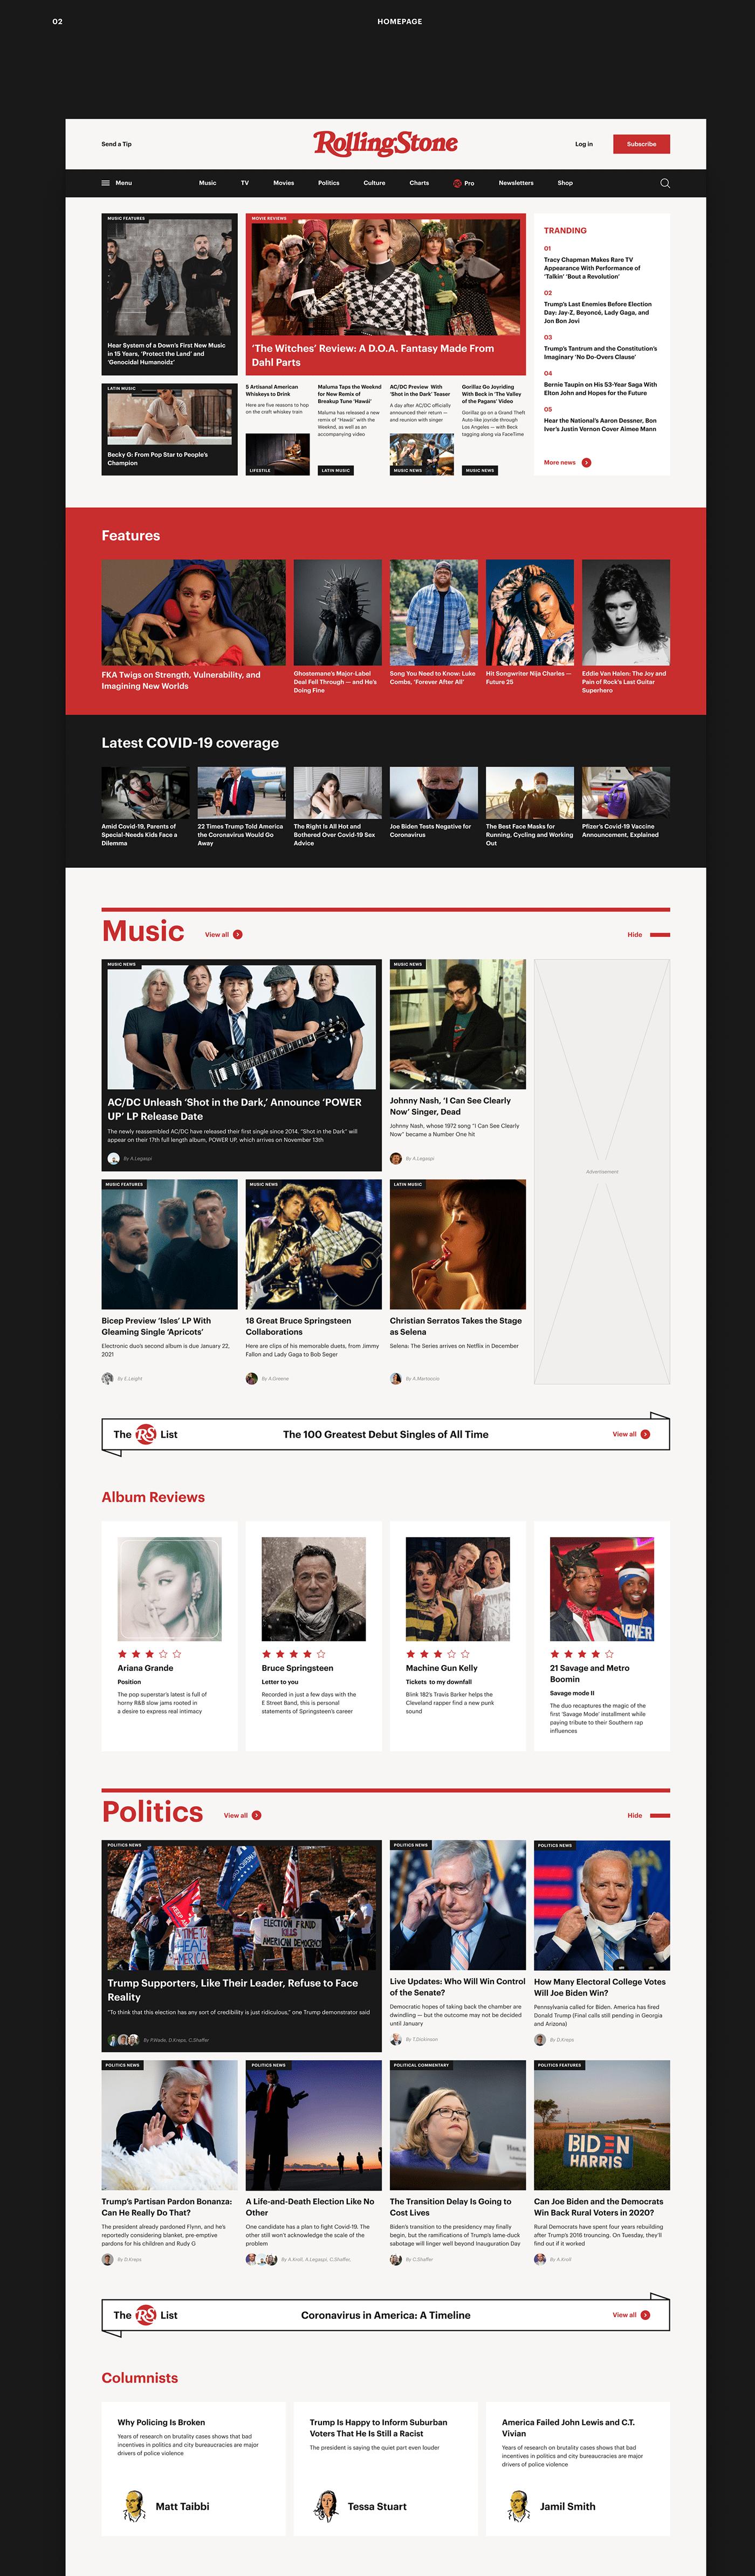 animation  concept interaction magazine news redesign UI uiux user interface Webdesign